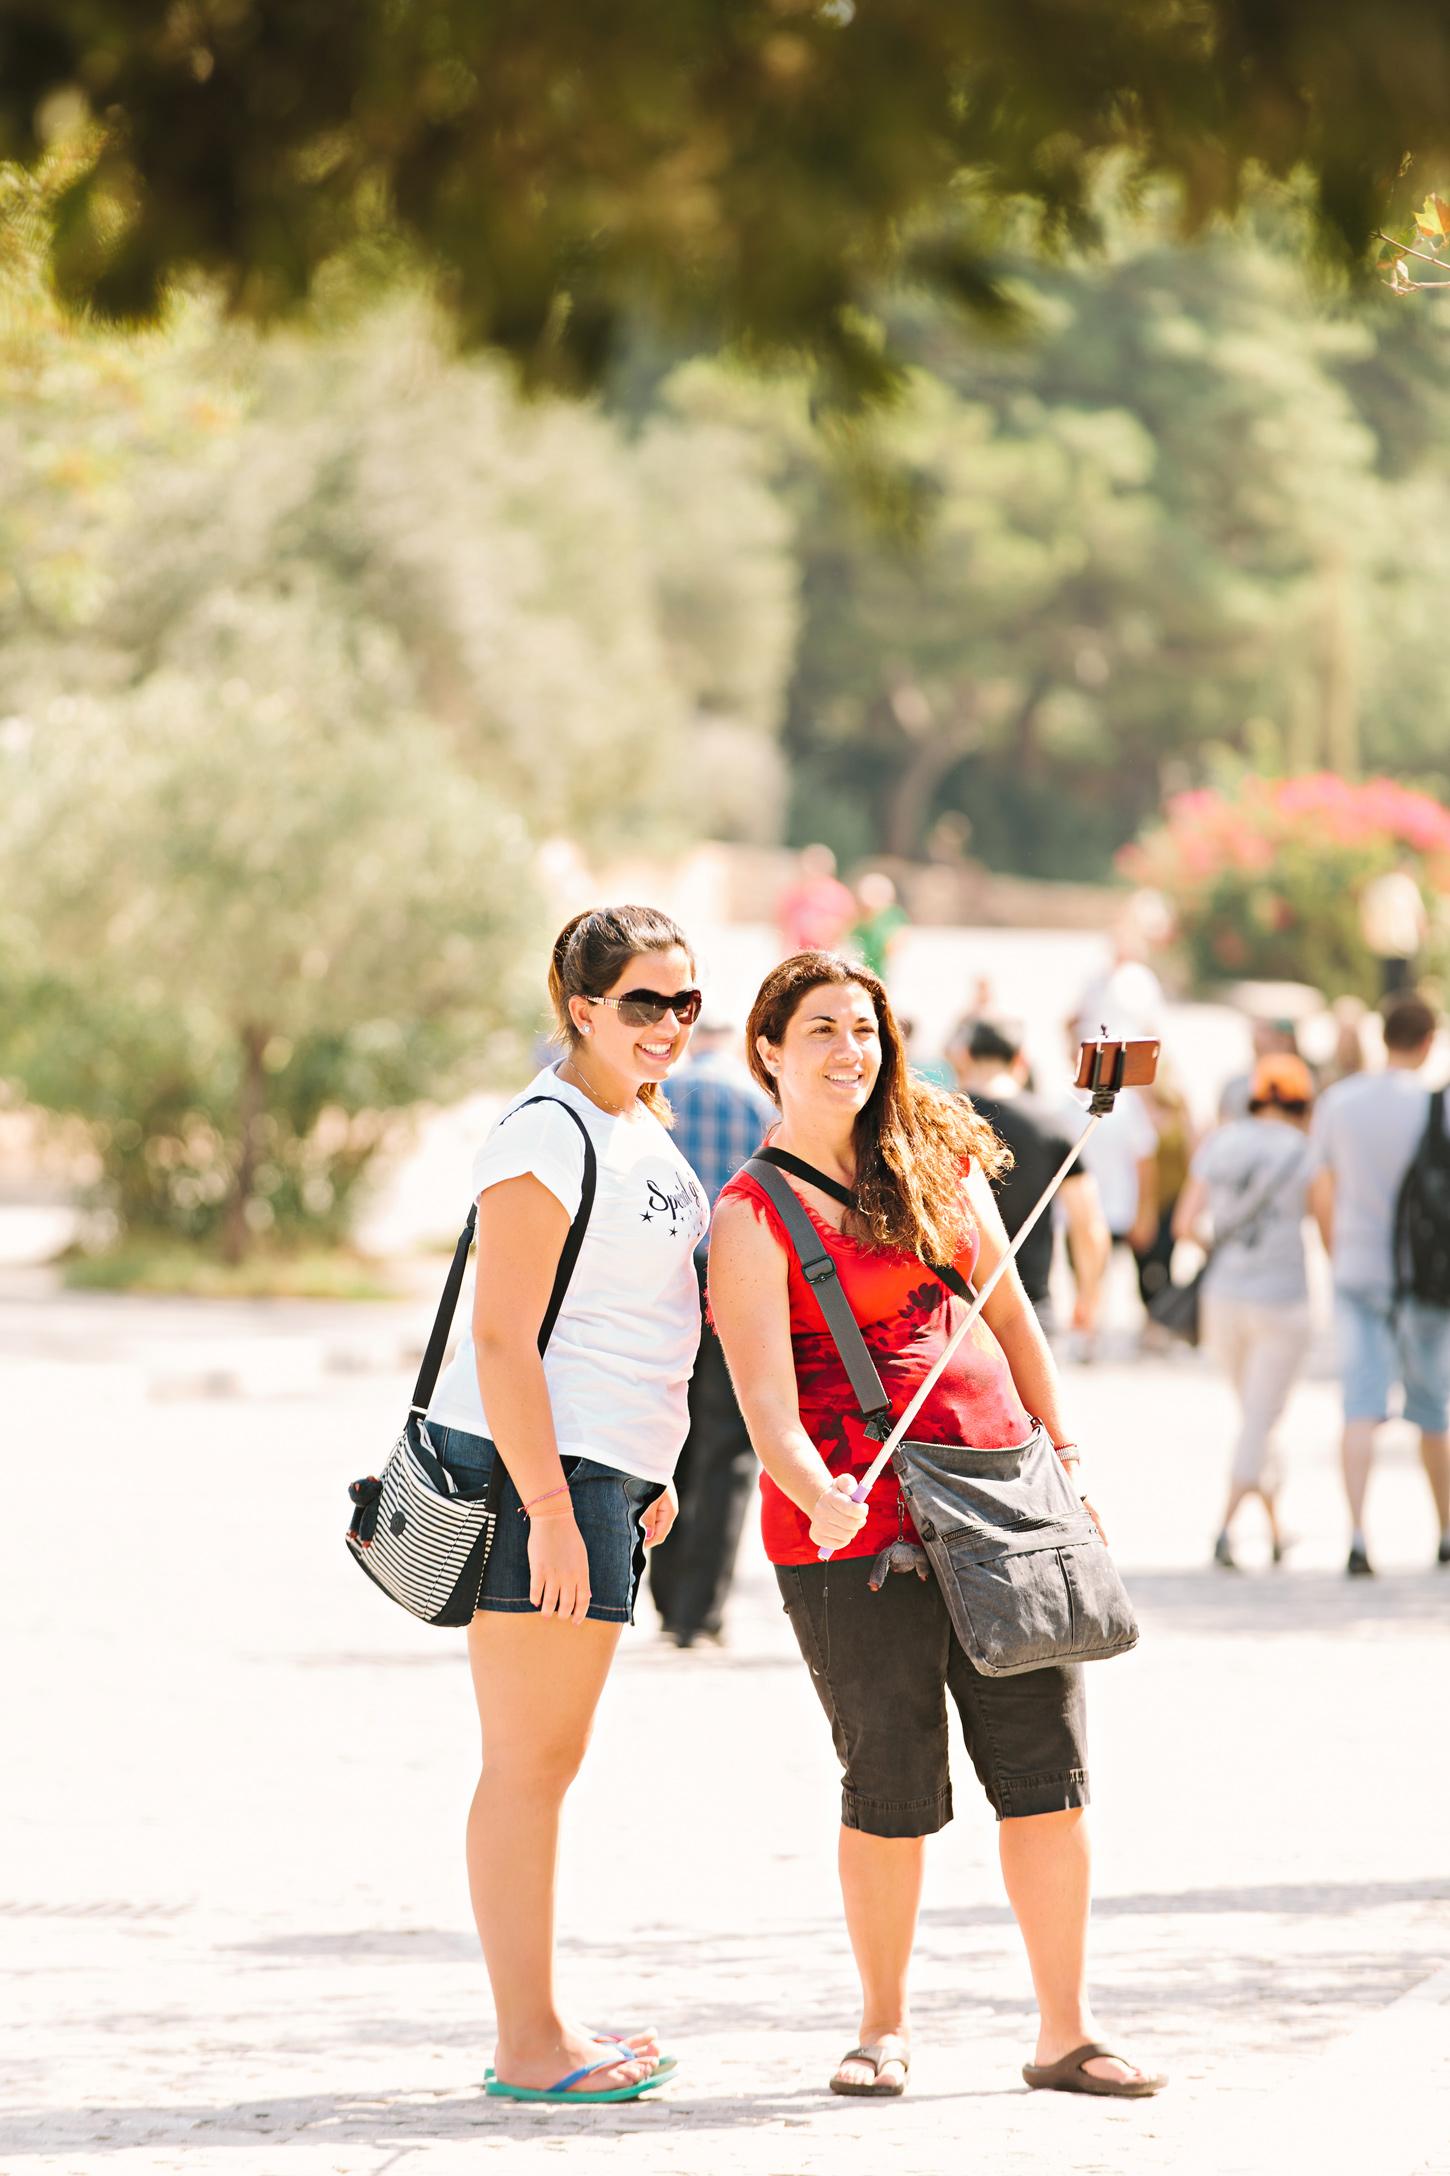 CindyGiovagnoli_Athens_Greece_travel_photographer-049.jpg